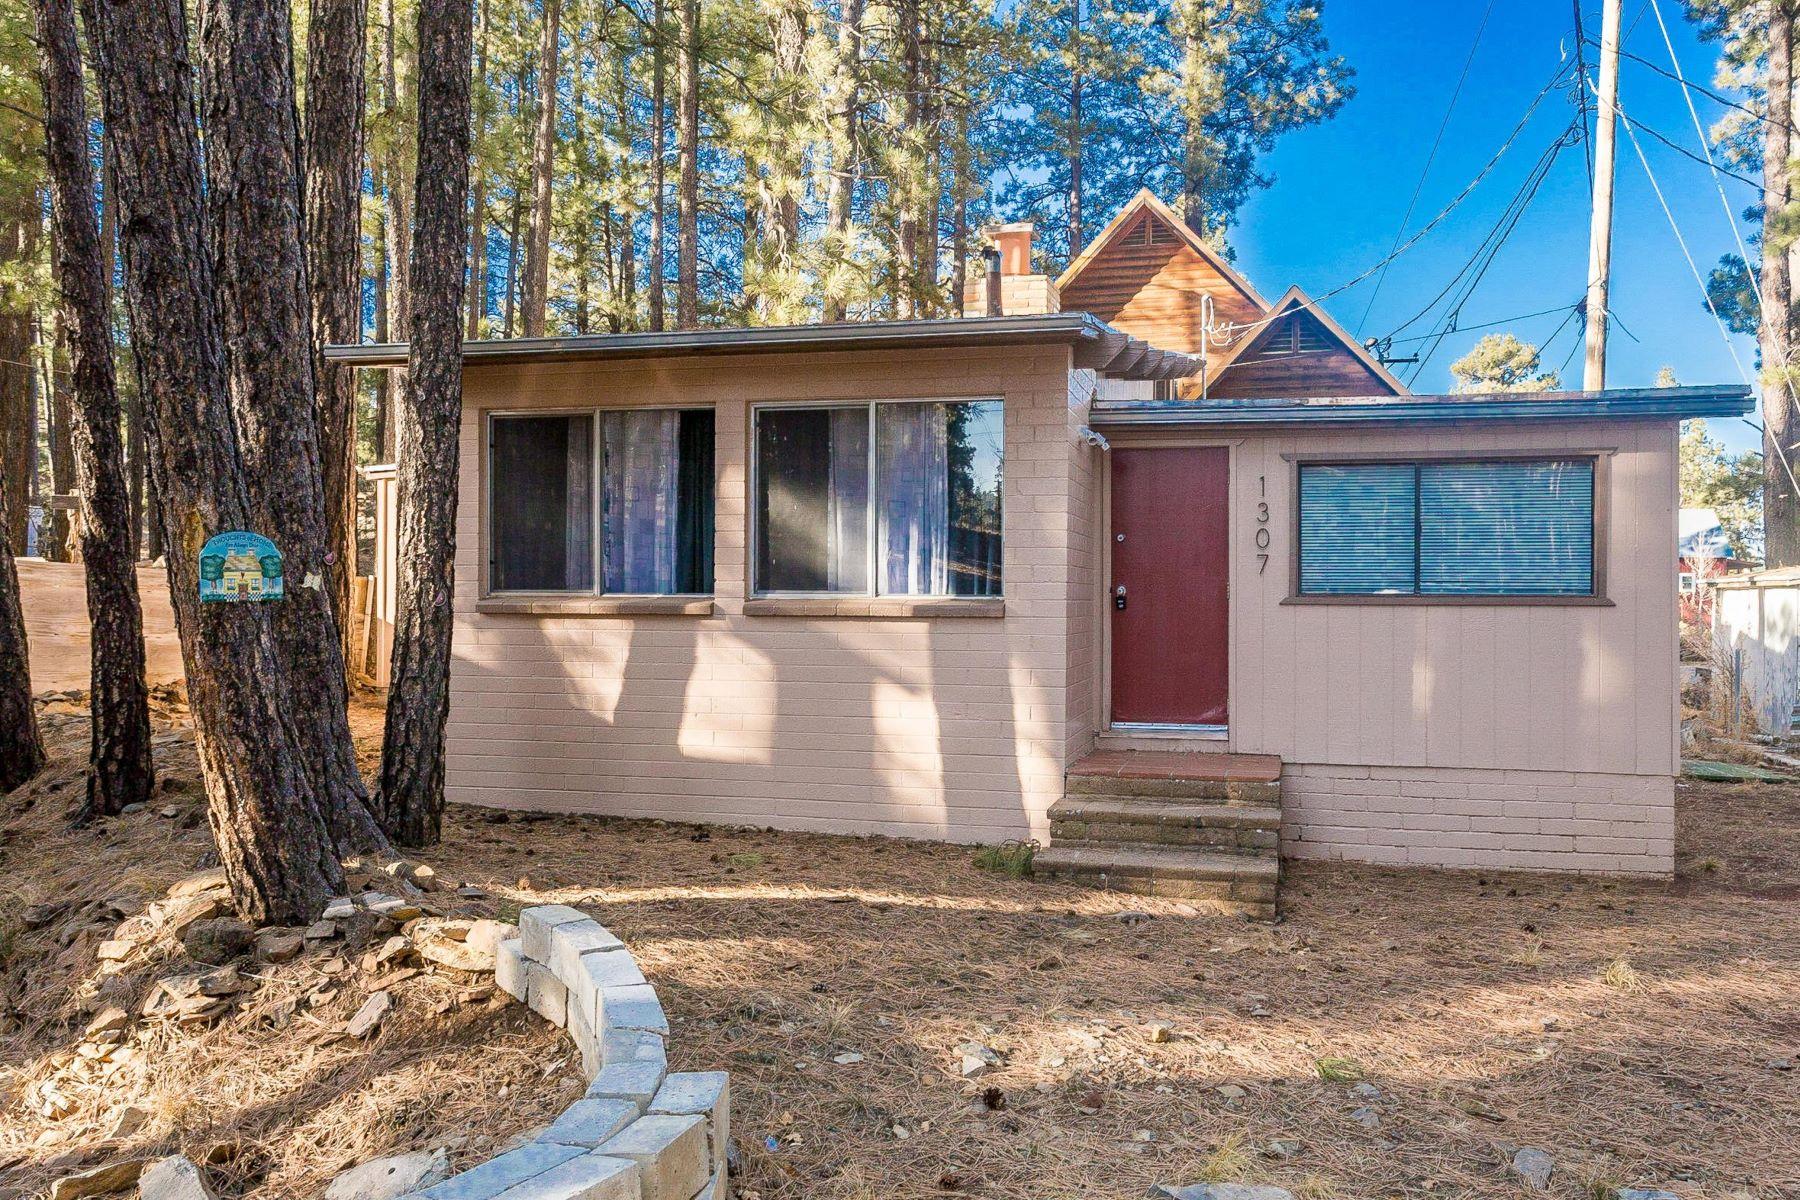 واحد منزل الأسرة للـ Sale في Awesome Turn Key Cabin in The Pines 1307 Smokey TRL, Mormon Lake, Arizona, 86038 United States